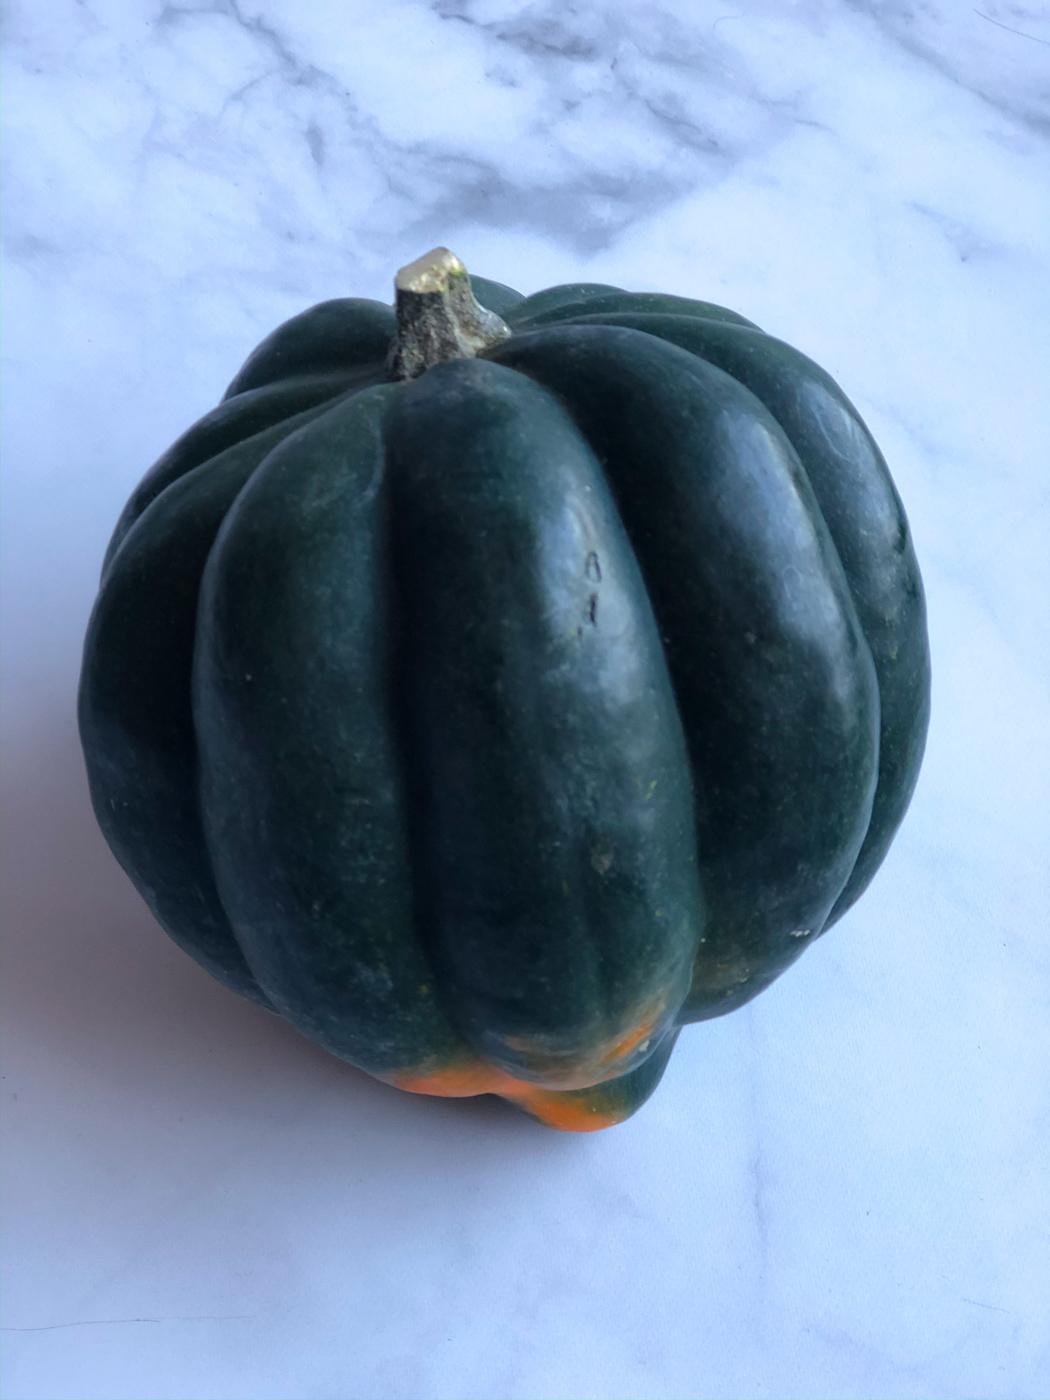 Meet Your Ingredients: Acorn Squash